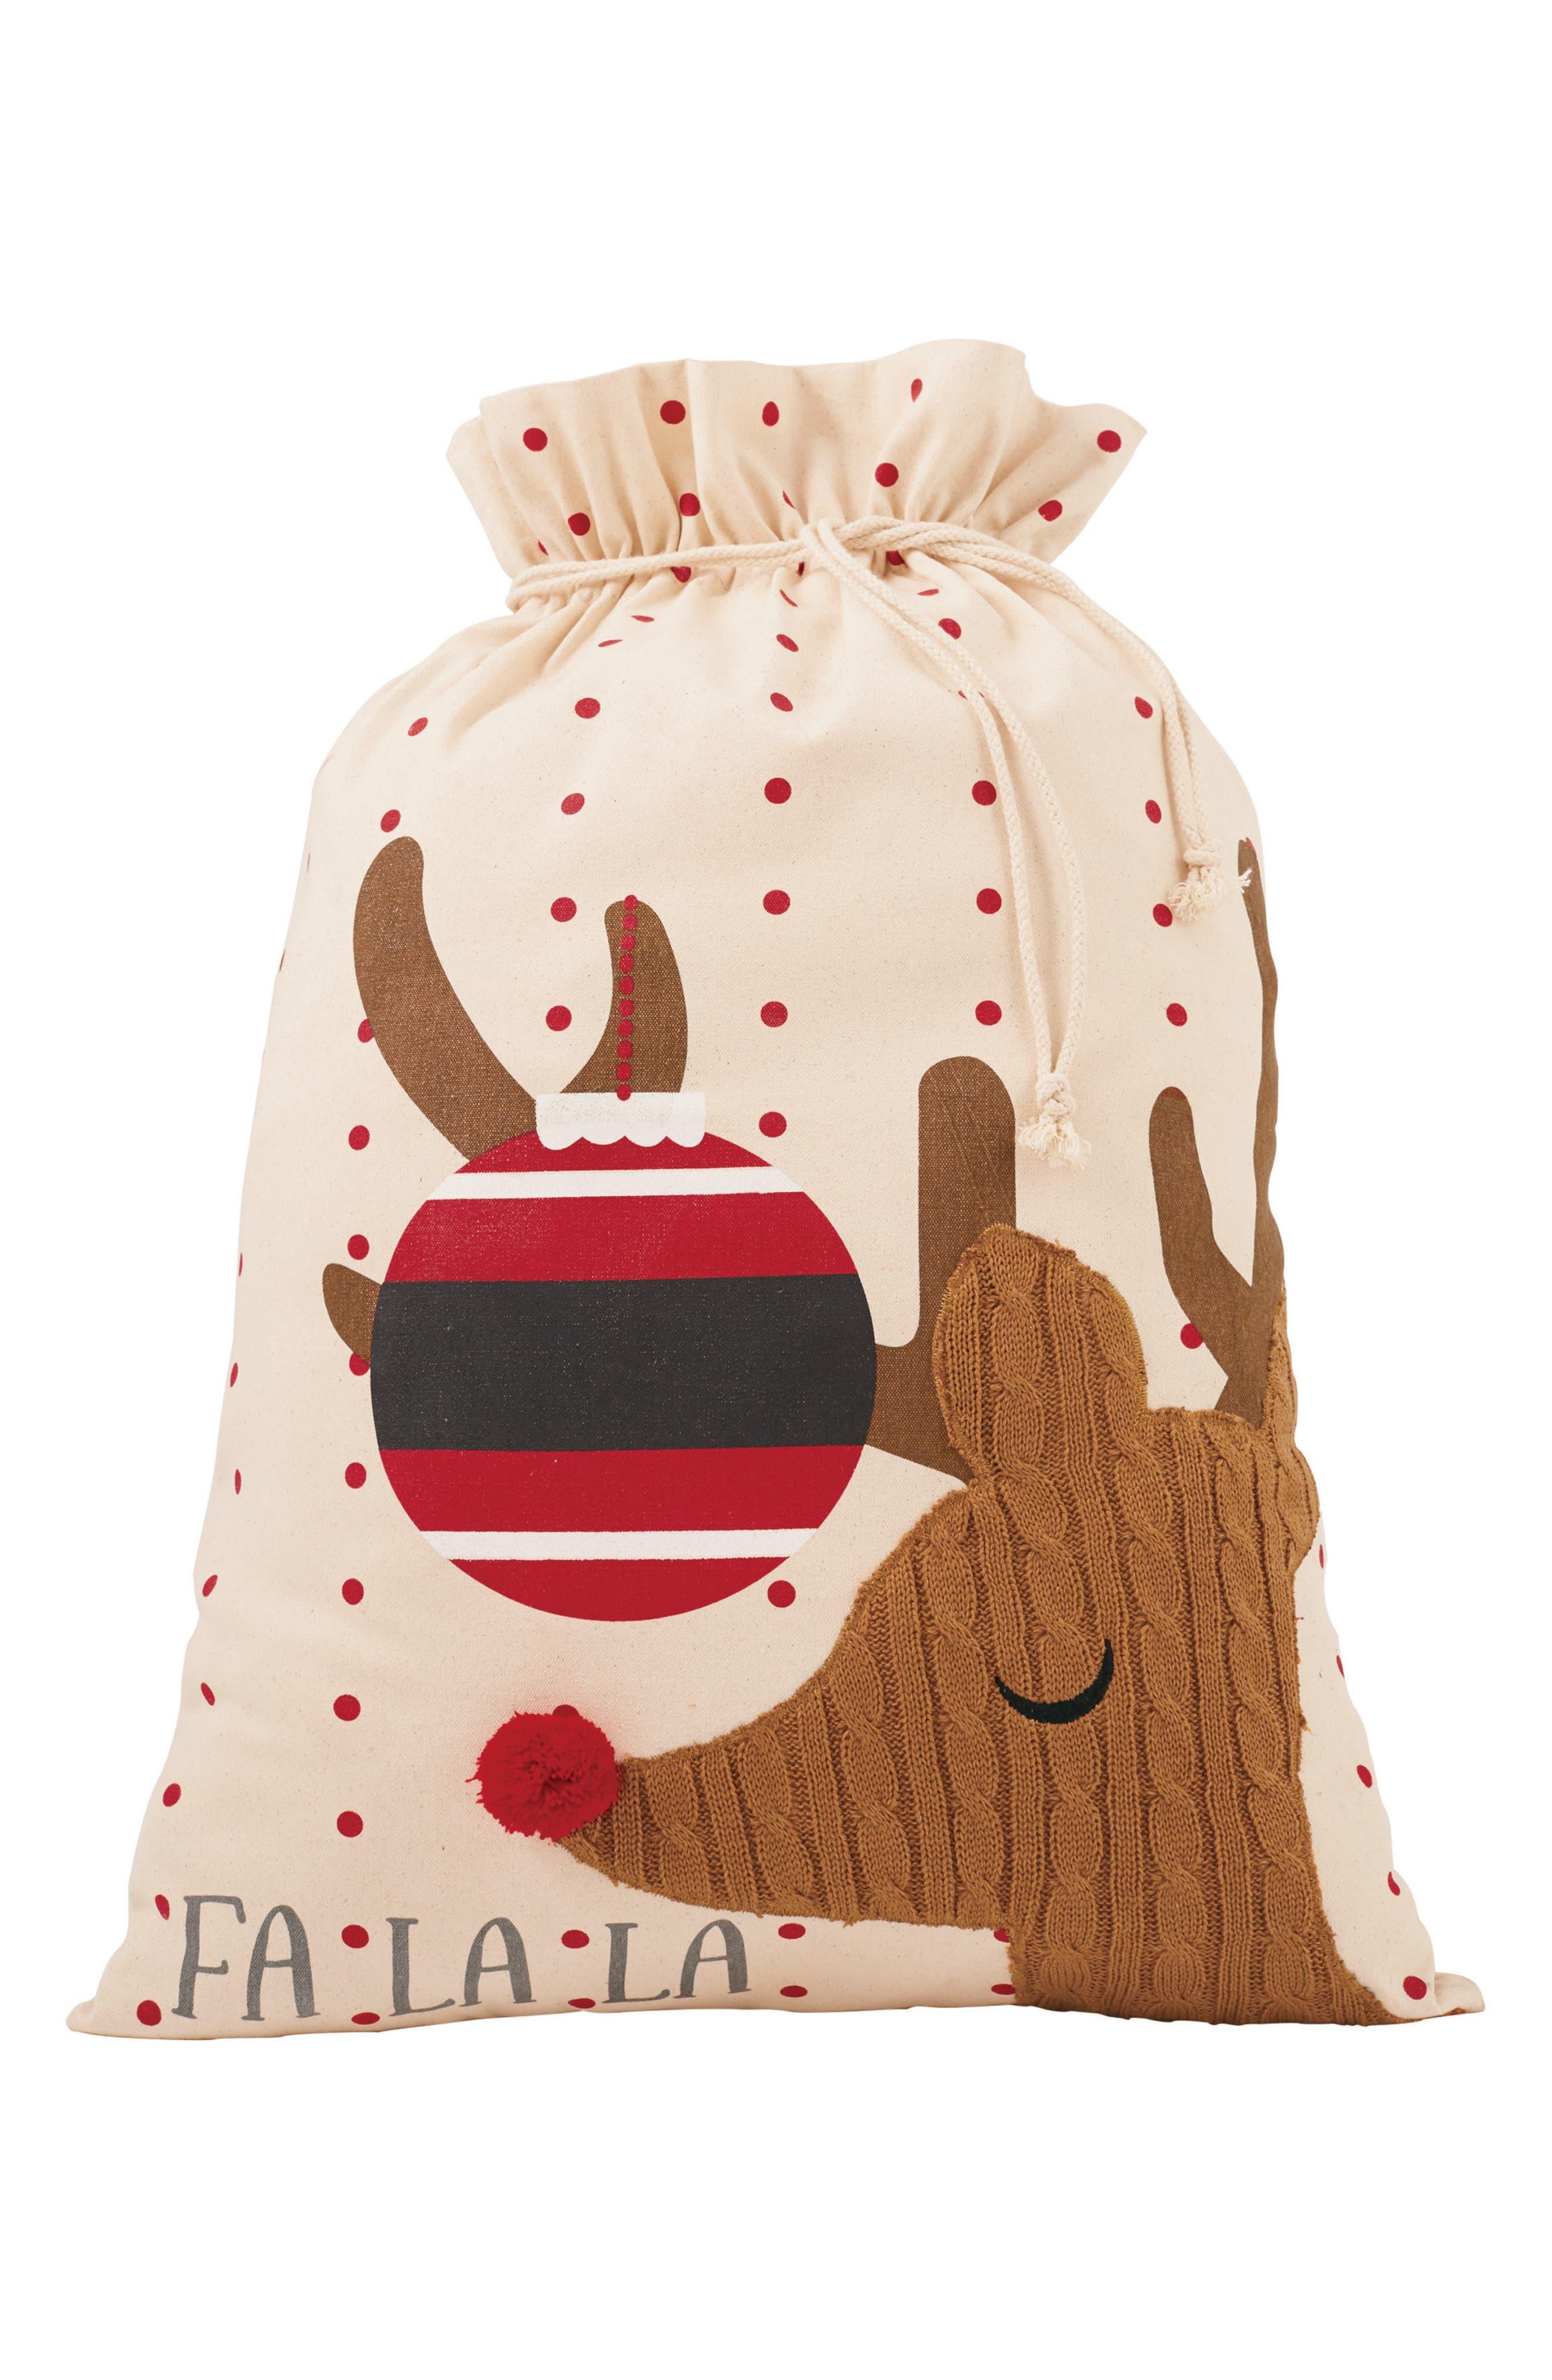 Fa La La Reindeer Canvas Gift Sack,                         Main,                         color, Tan